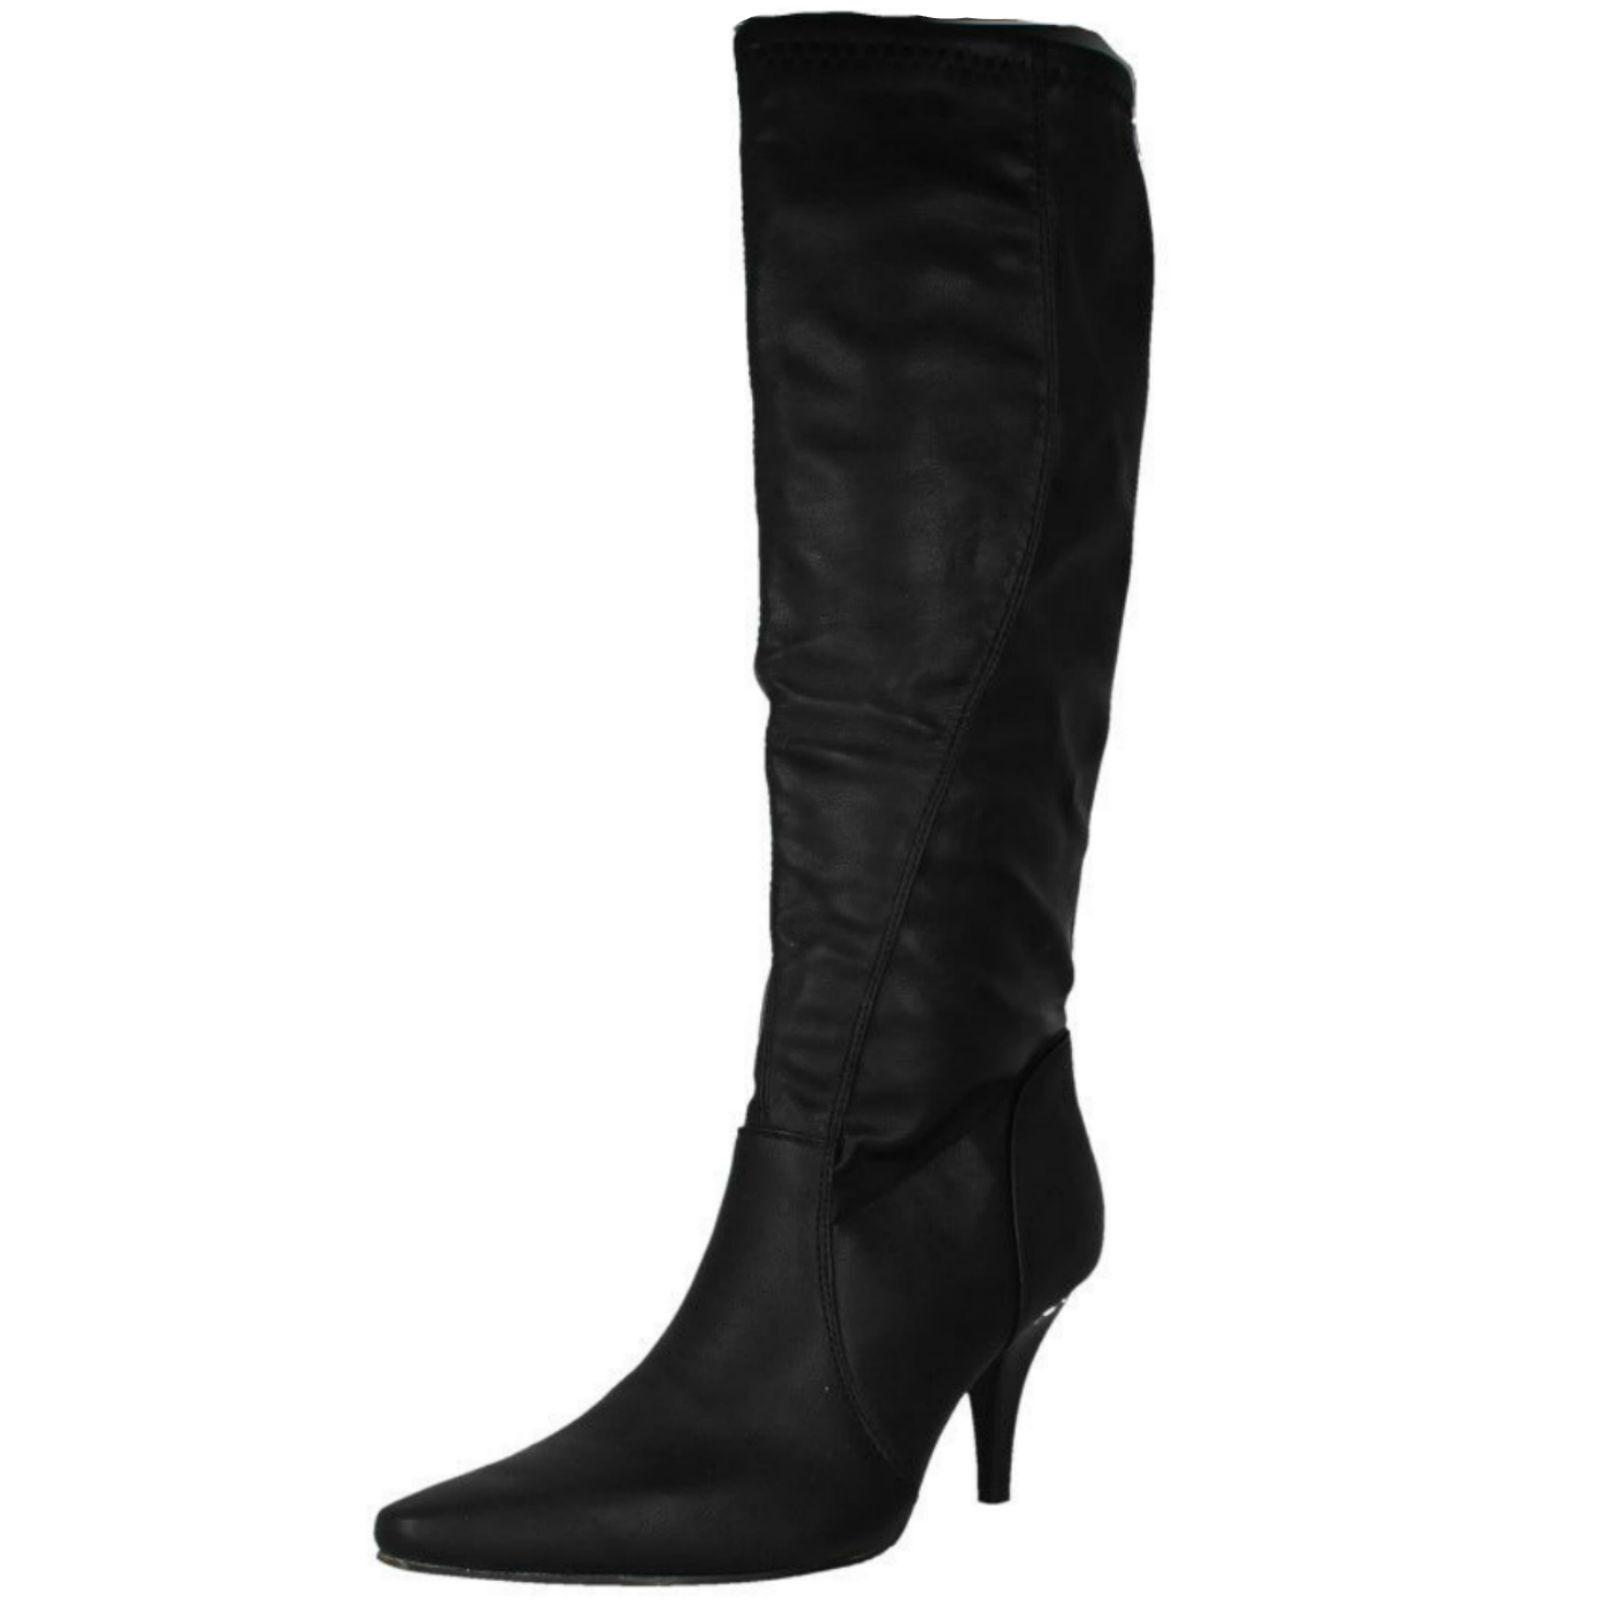 LADIES SPOT ON ZIP POINTED TOE OFFICE SMART SLIM HEEL LONG WINTER BOOTS F5684